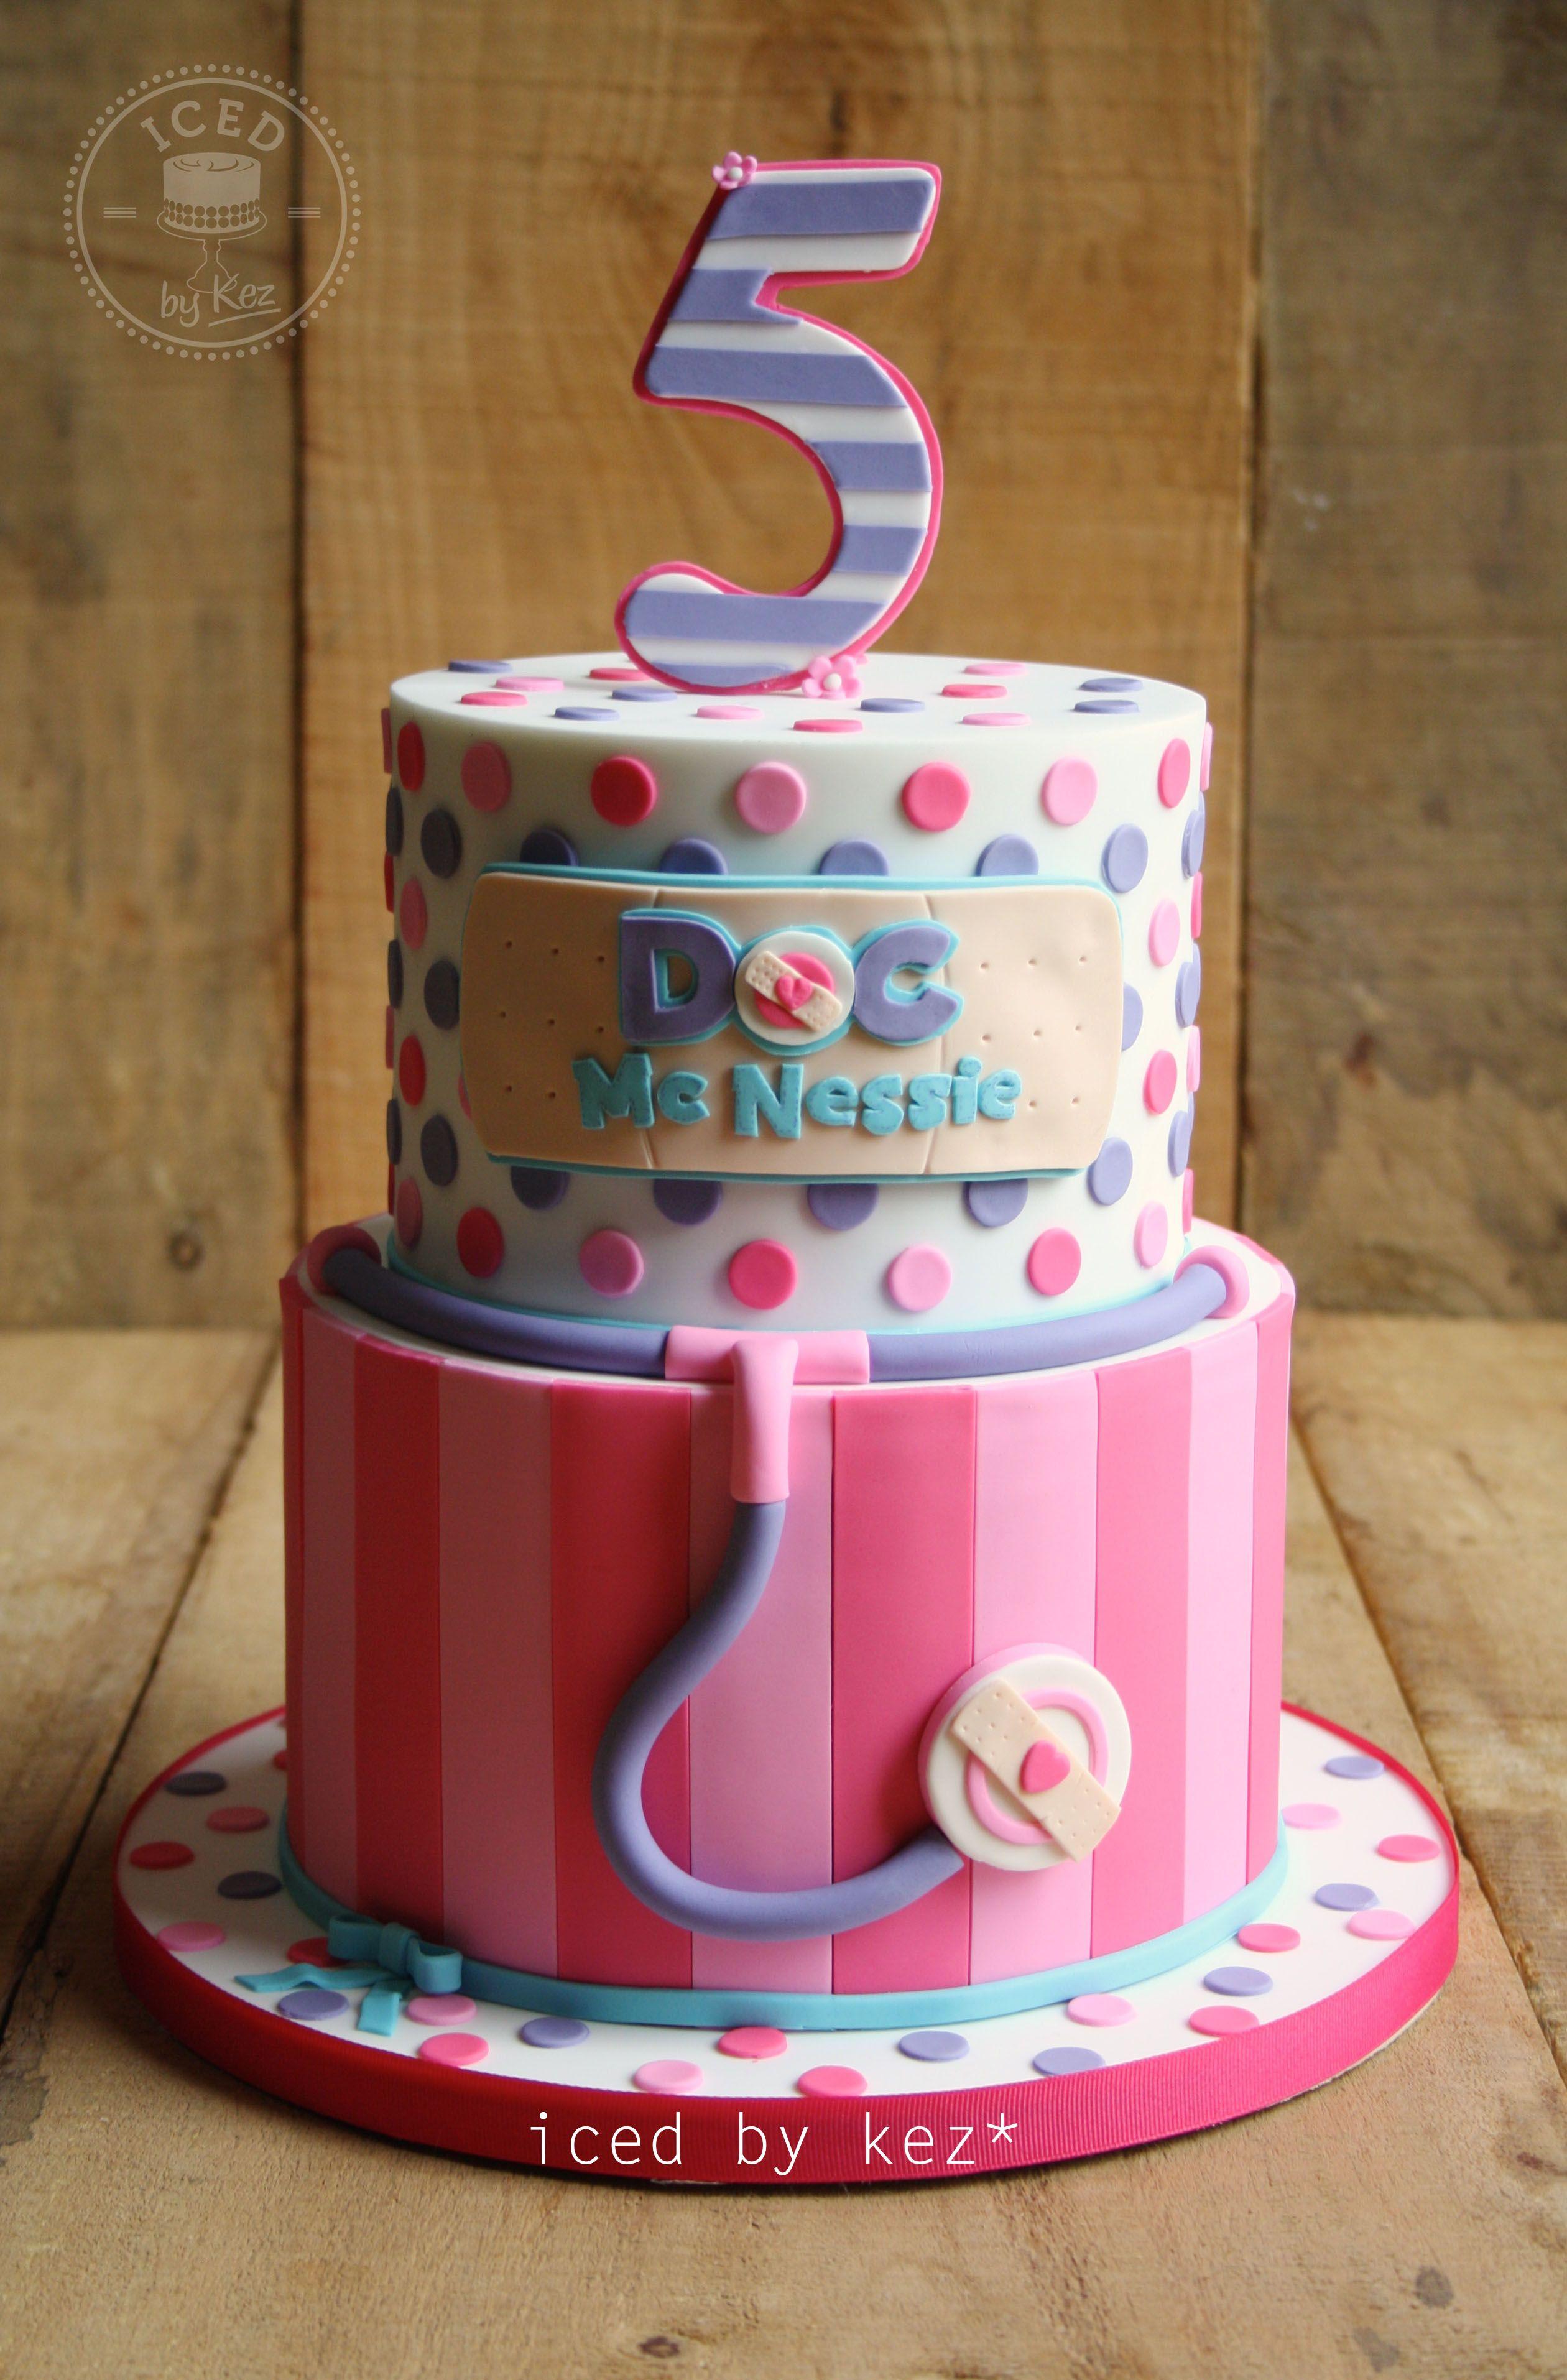 Doc mcstuffins bandages doc mcstuffins party ideas on pinterest doc - Doc Mcstuffins Themed Cake For A 5th Birthday Iced By Kez Docmcstuffins